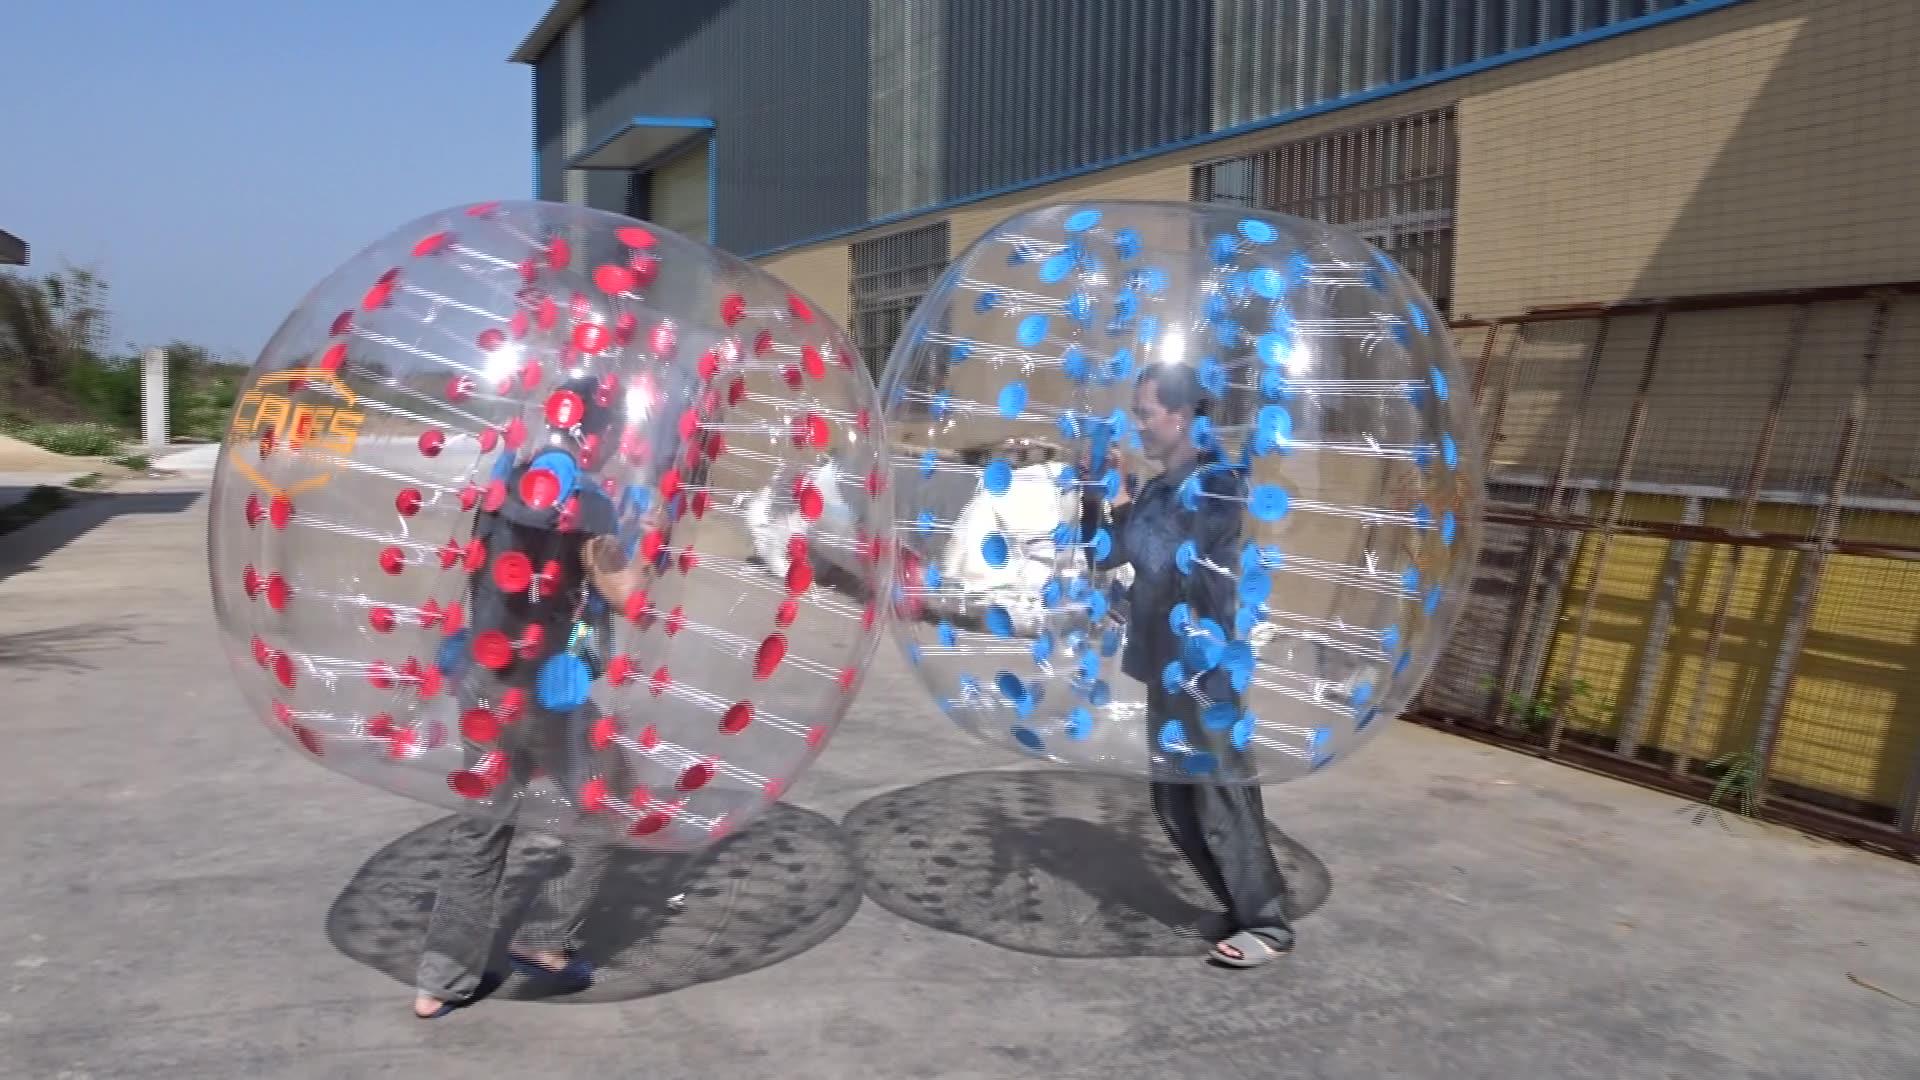 TPU atau PVC Inflatable Manusia Zorb Bola Track, Inflatable Gelembung Bola Inflatable Berjalan Bola untuk Promosi